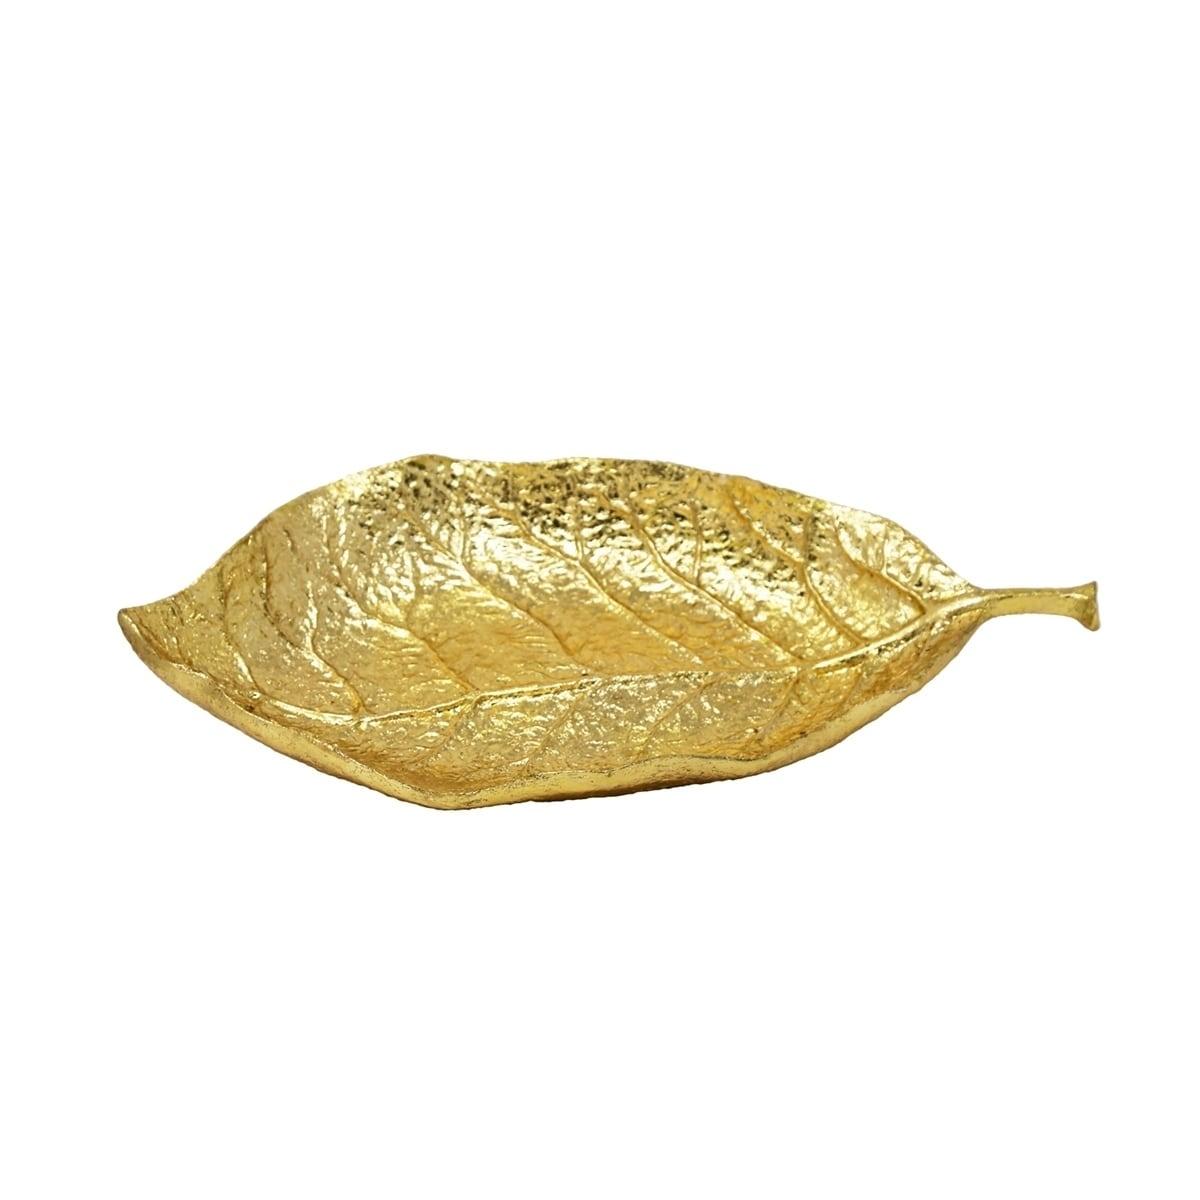 Shop Sagebrook Home 13077-01 Polyresin Leaf Wall Decor, Gold ...